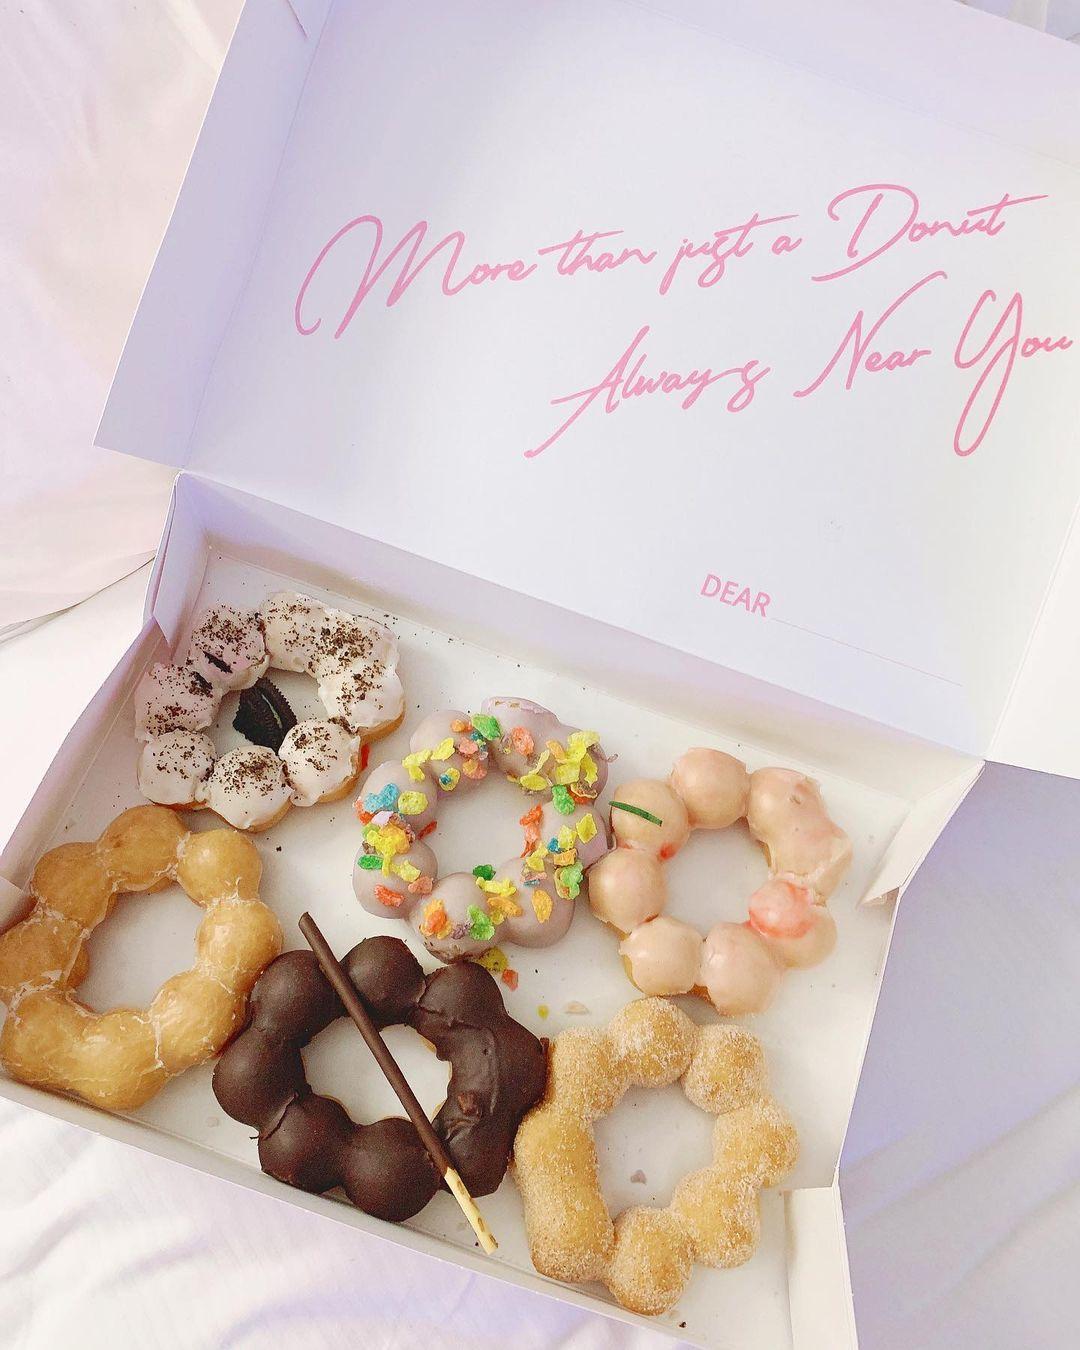 Las Vegas少女心甜甜圈🍩 图2